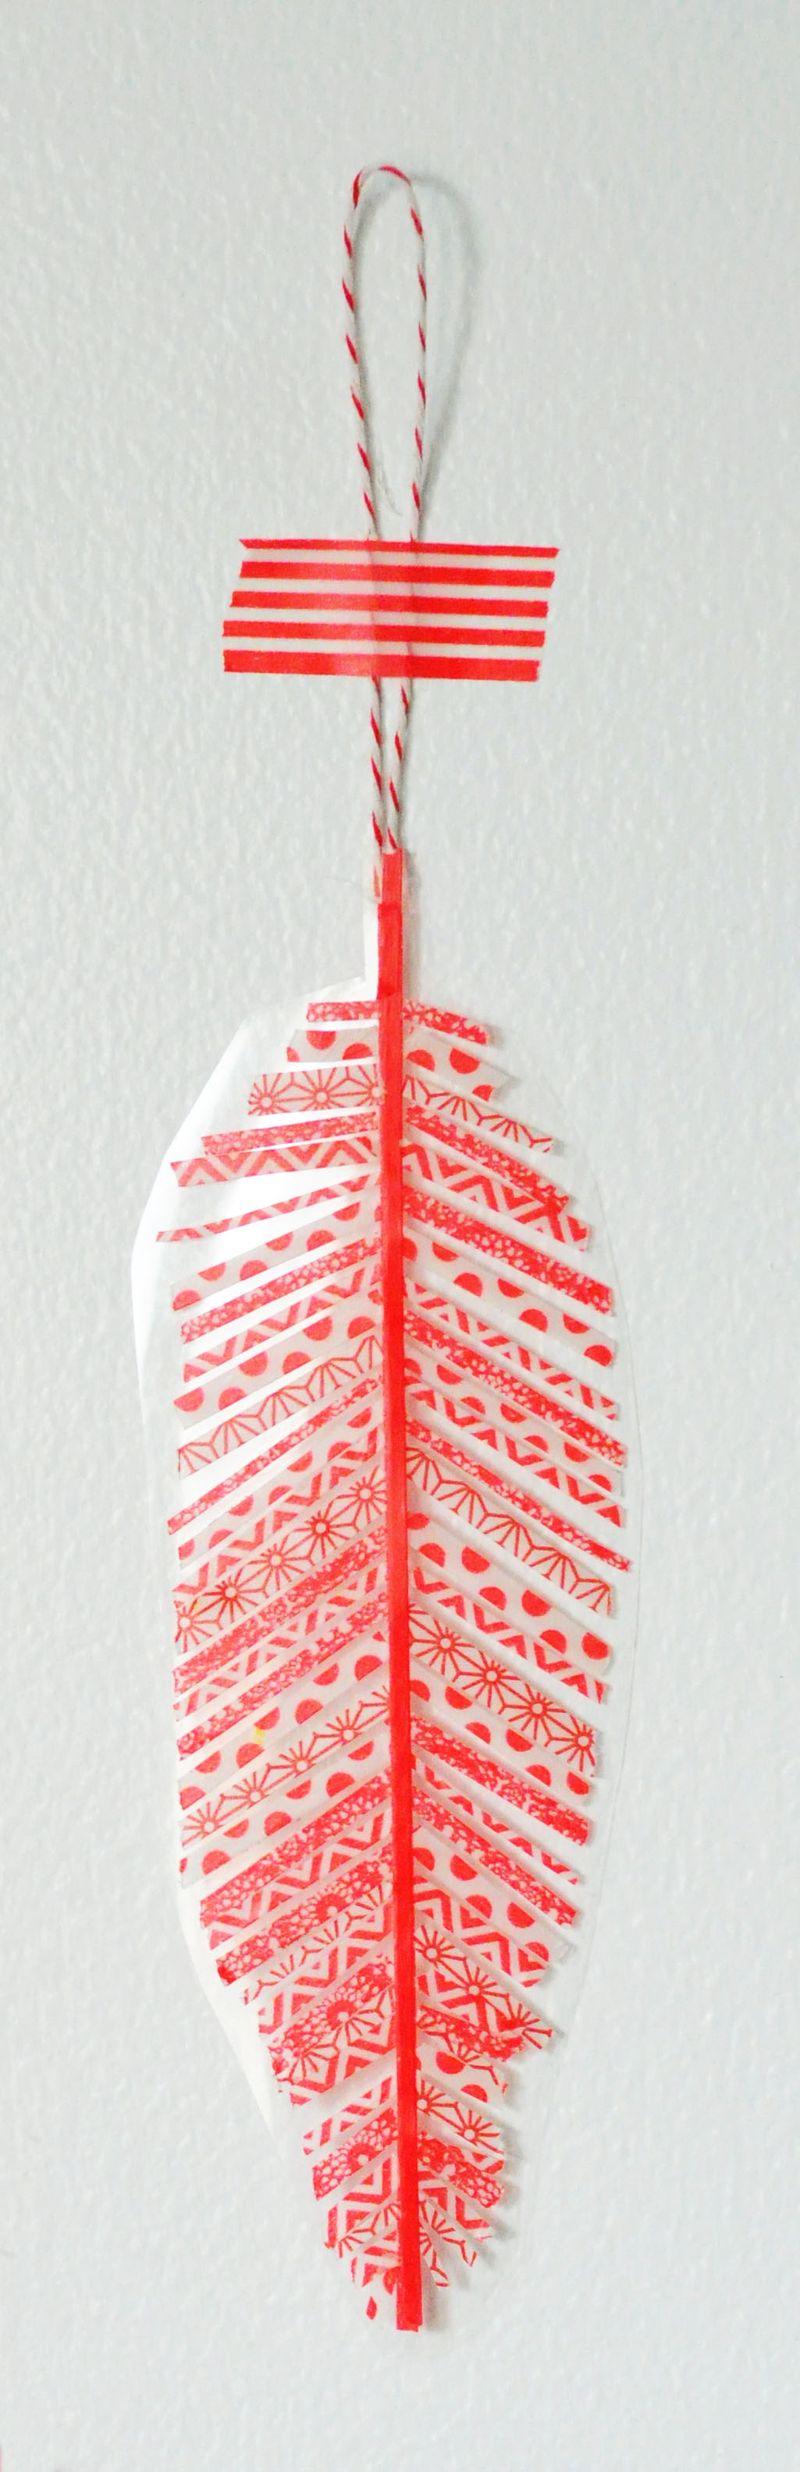 Washi-tape-ornament